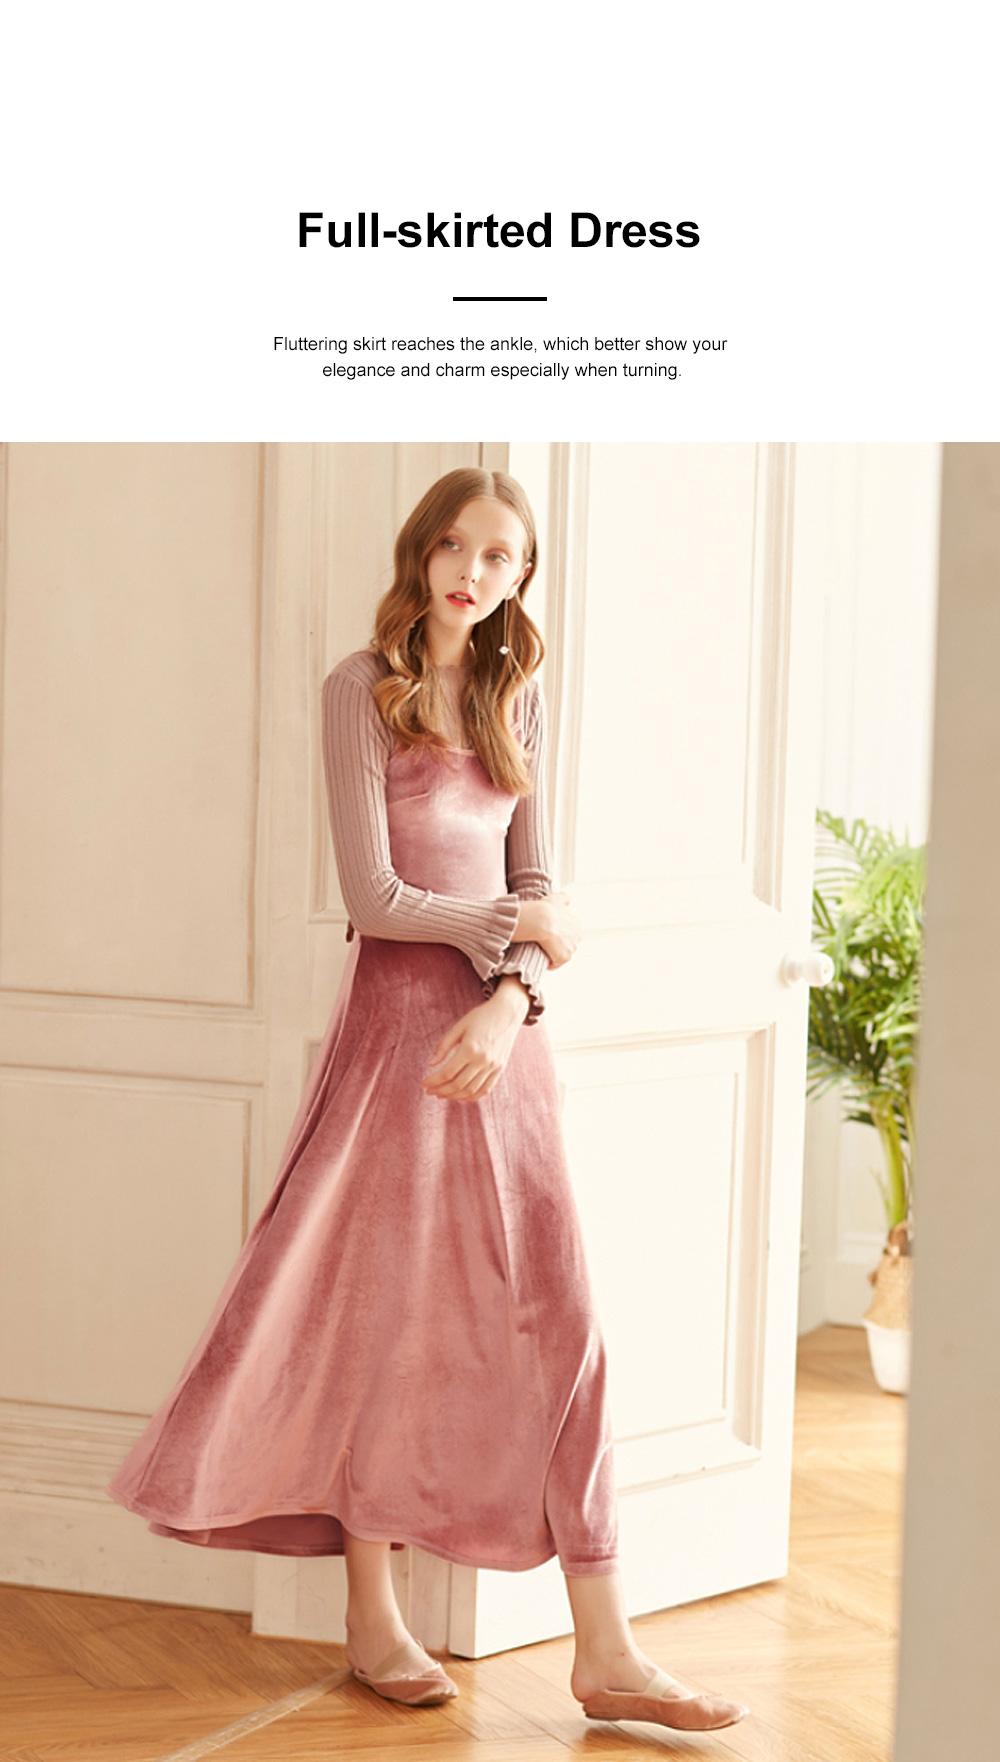 Women's Overall Suspender Dress Velvet Classic Retro Style with High Waist and Back Strap Ankle Length Bottoming Vest Skirt 1